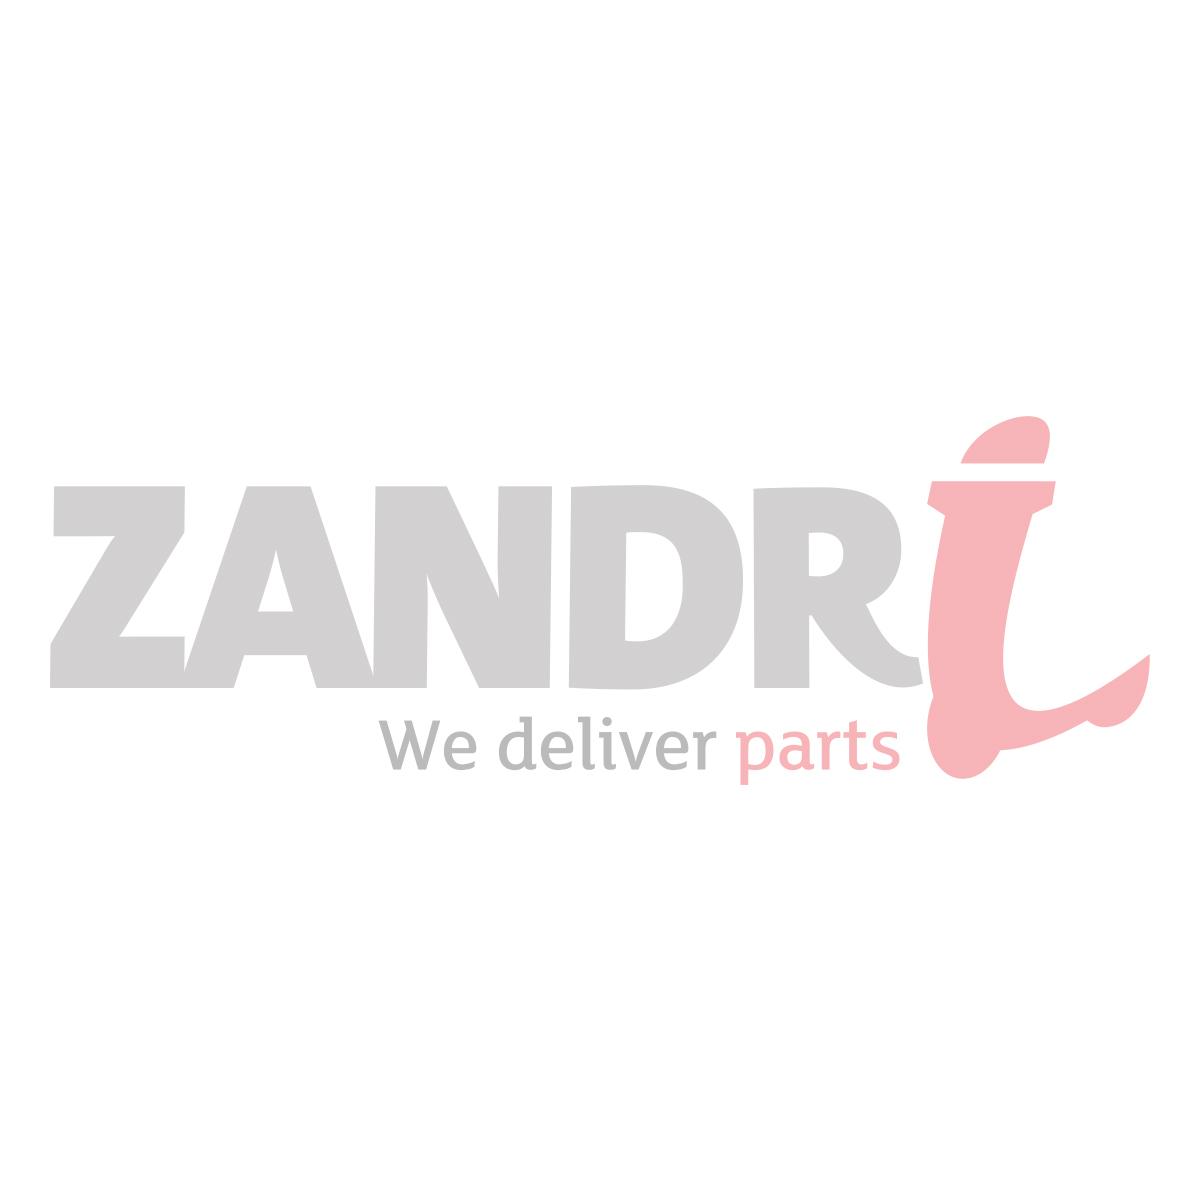 Geleiderubber set varioramplaat Honda / Kymco / Miarellin horizontaal+verticaal / Peugeot / Puch / Vespa Malossi 37